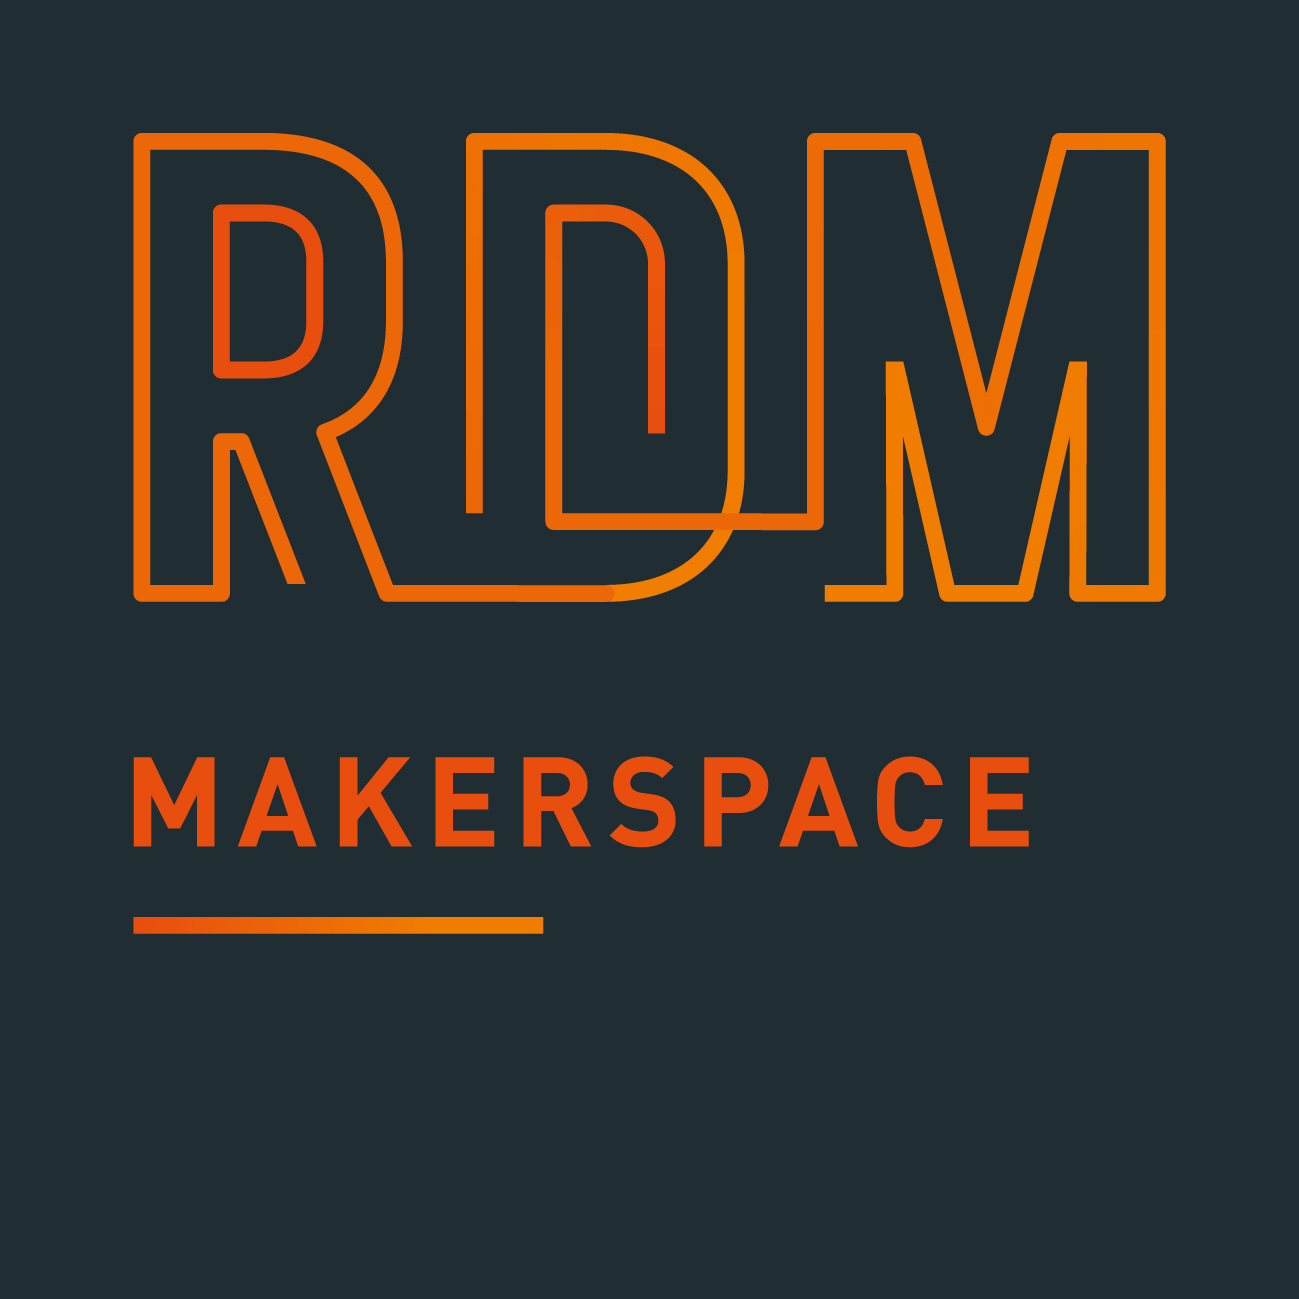 RDM Makerspace logo